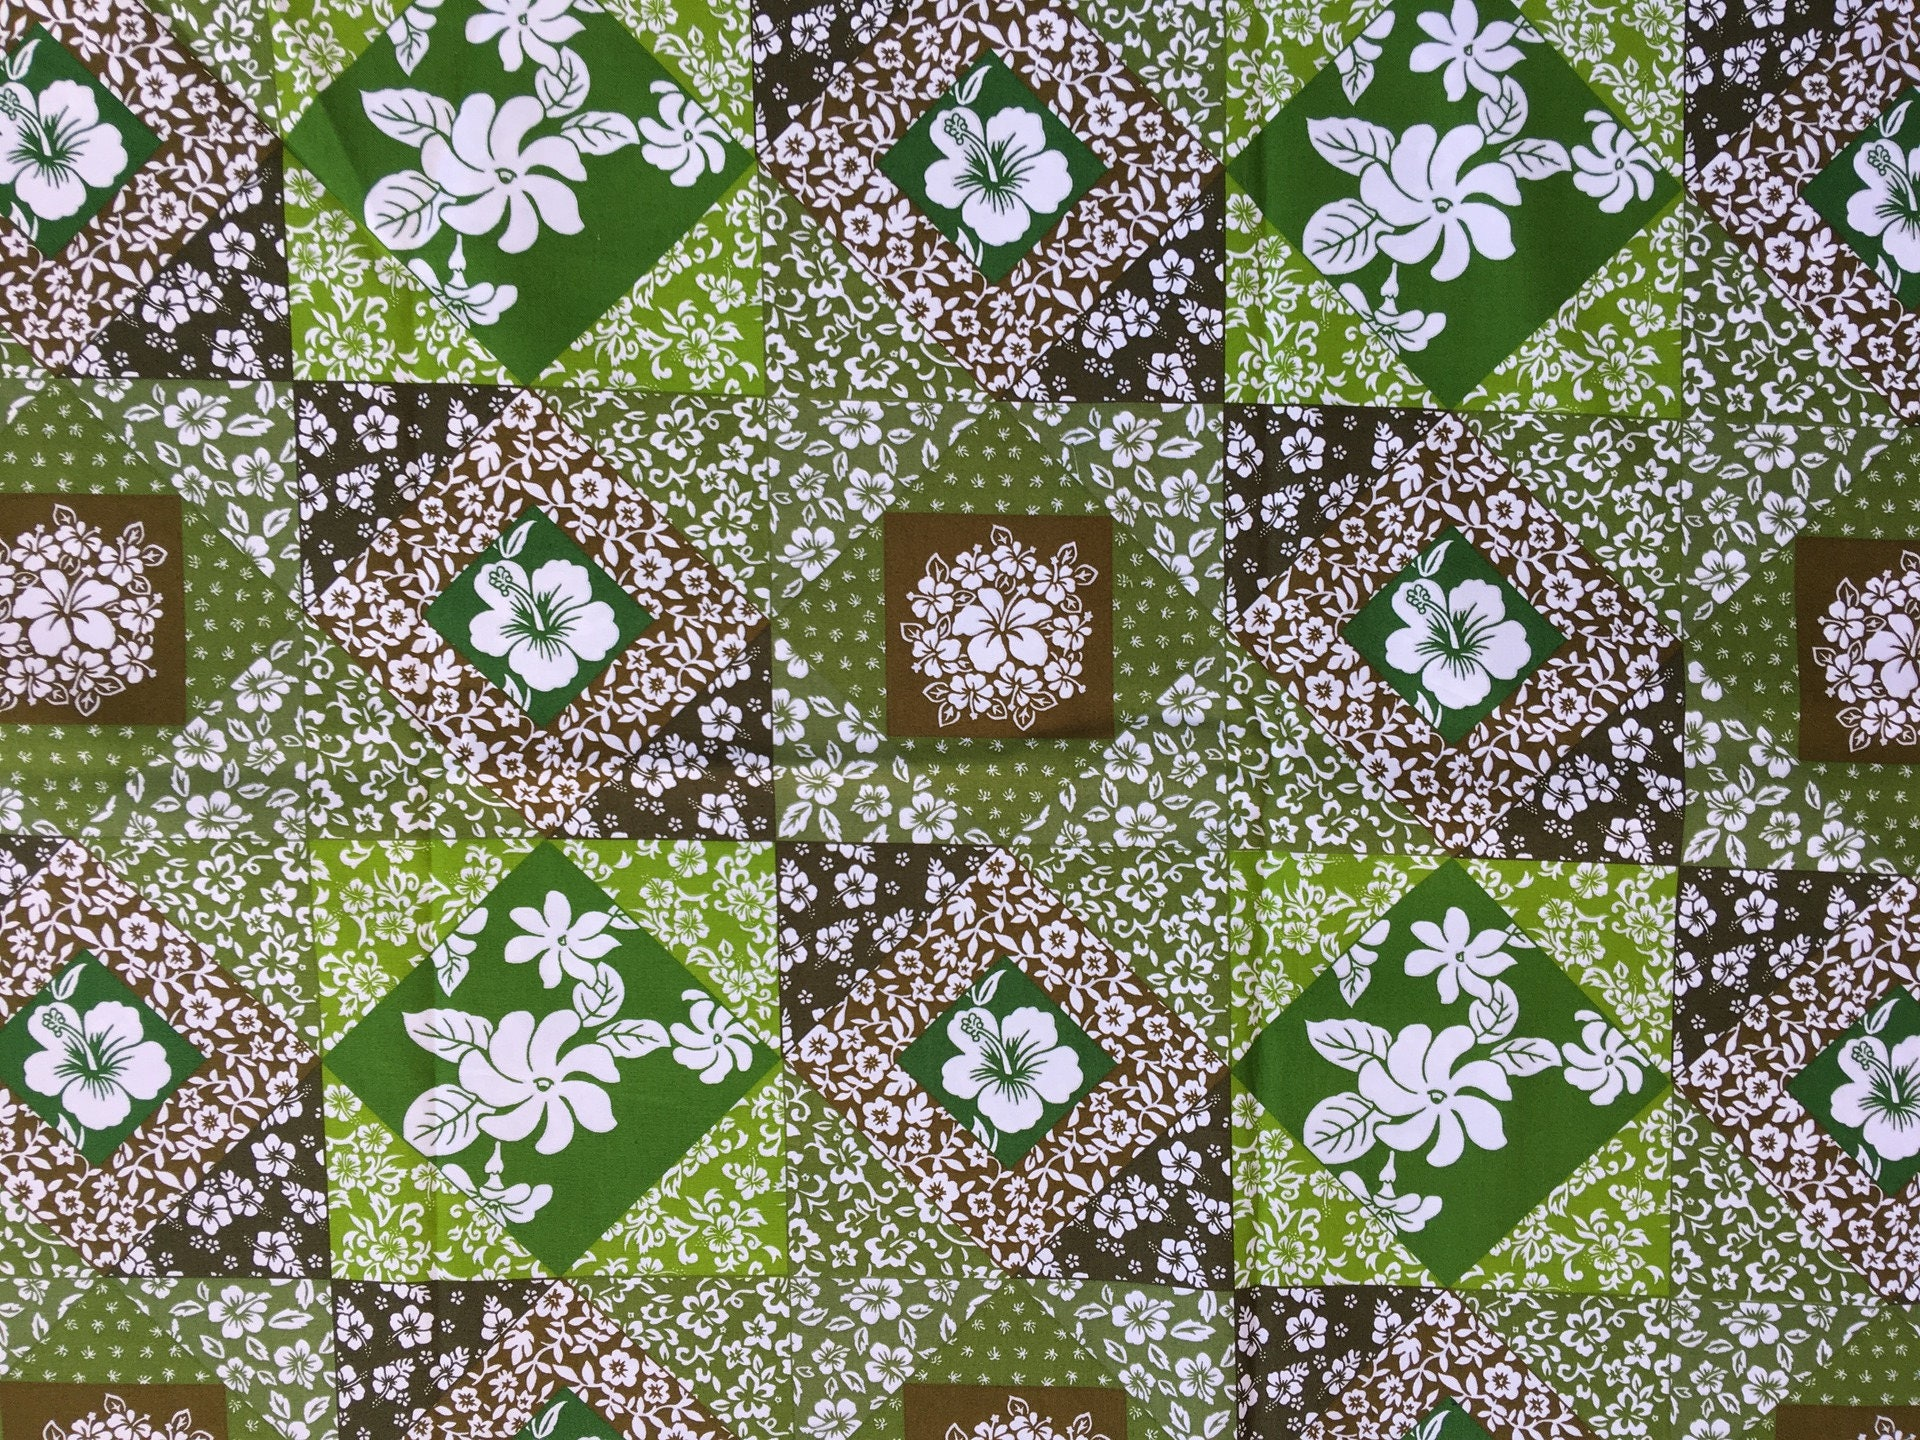 très joli tissu polynésien à motifs fleurs hibiscus